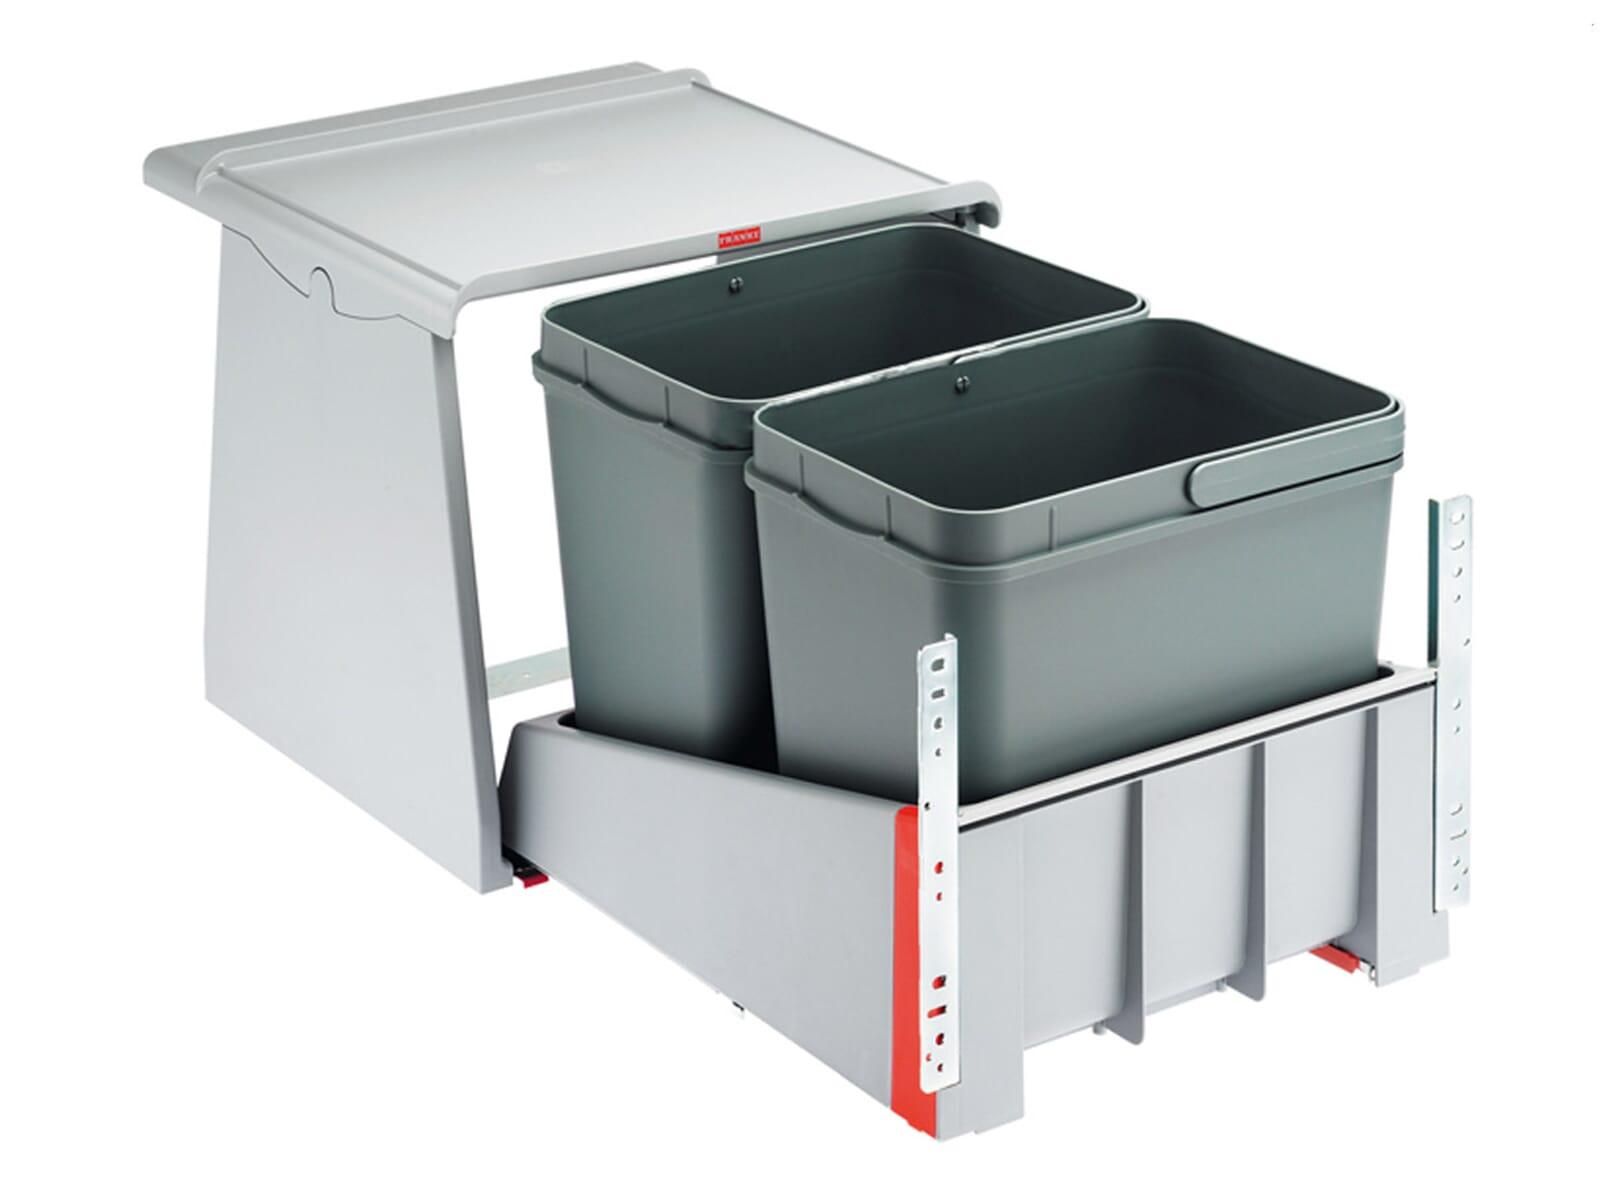 Produktabbildung Franke Sorter 700-45 Motion - 121.0173.361 Einbau Abfallsammler